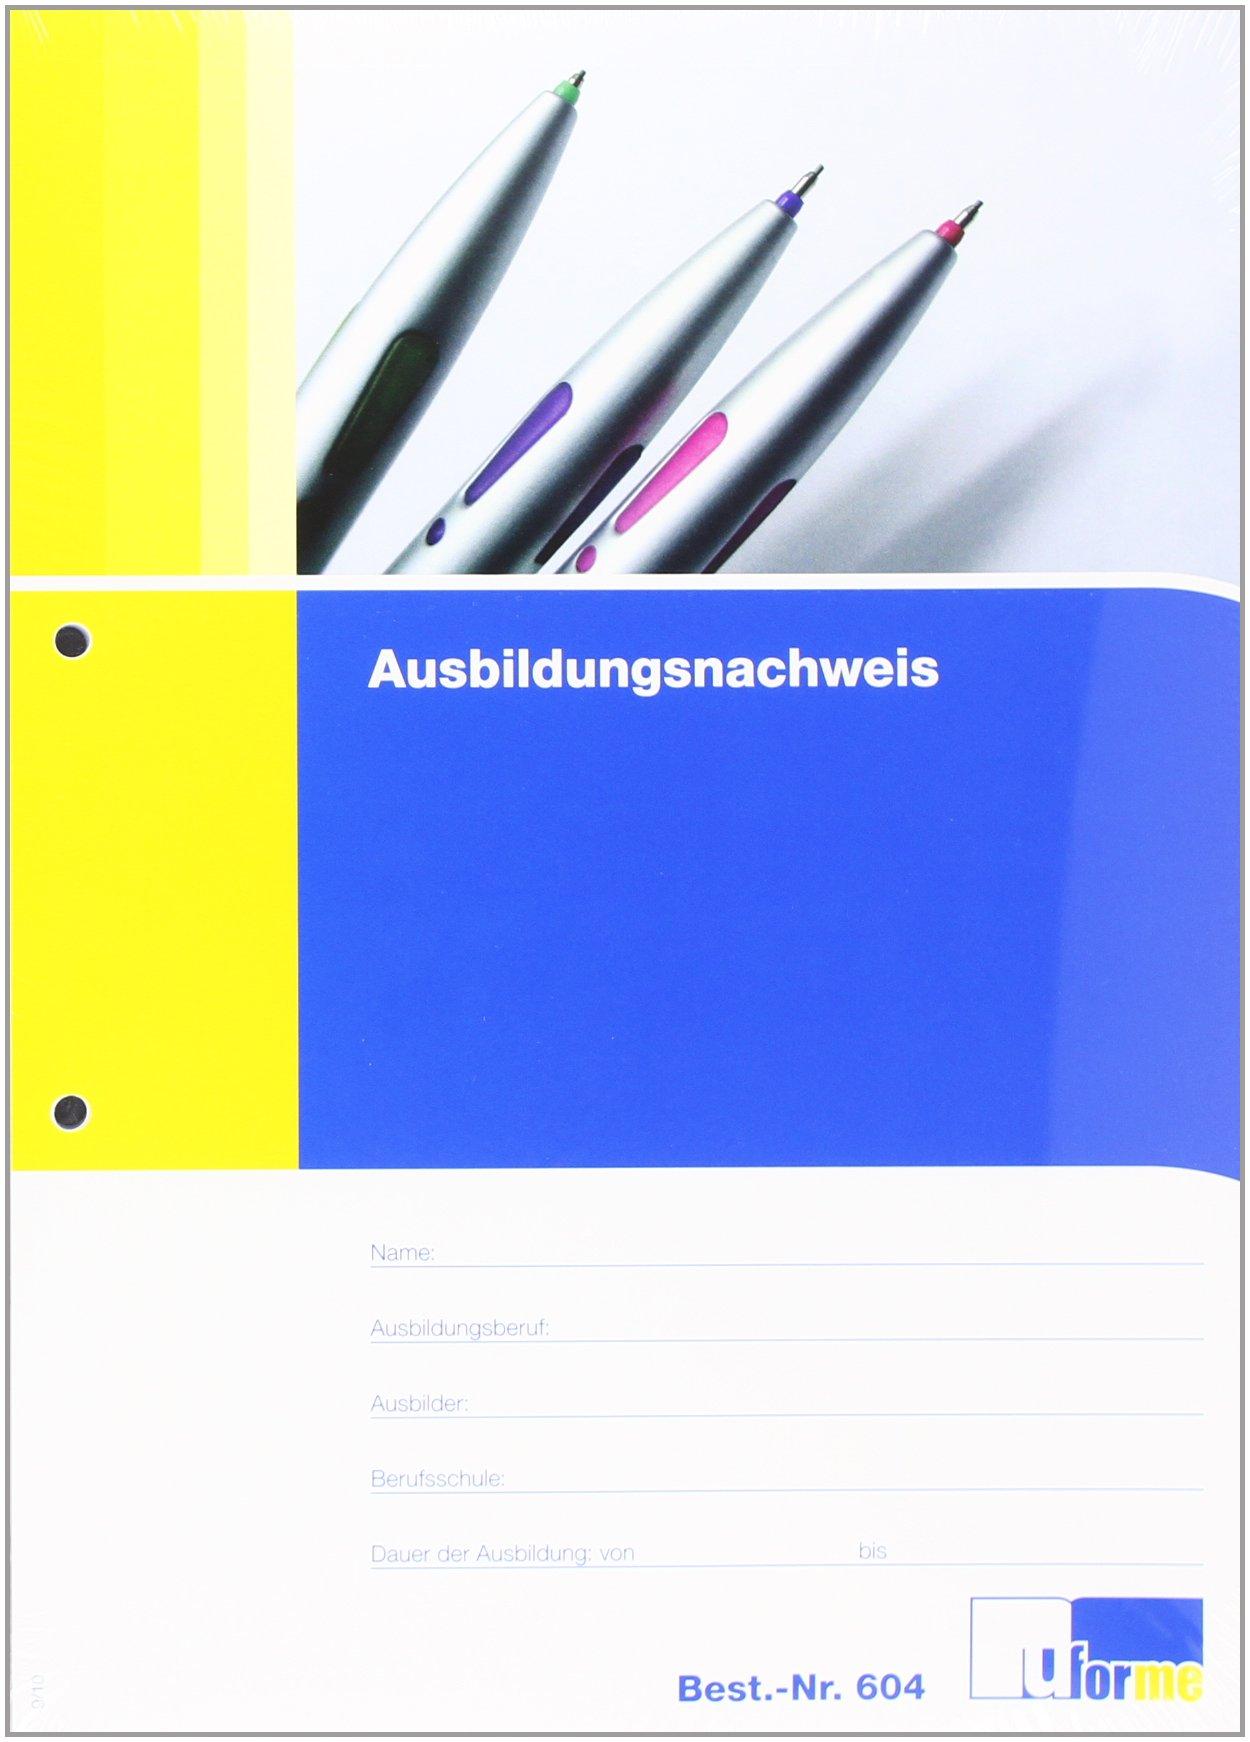 Ausbildungsnachweis 9783882346046 Amazoncom Books